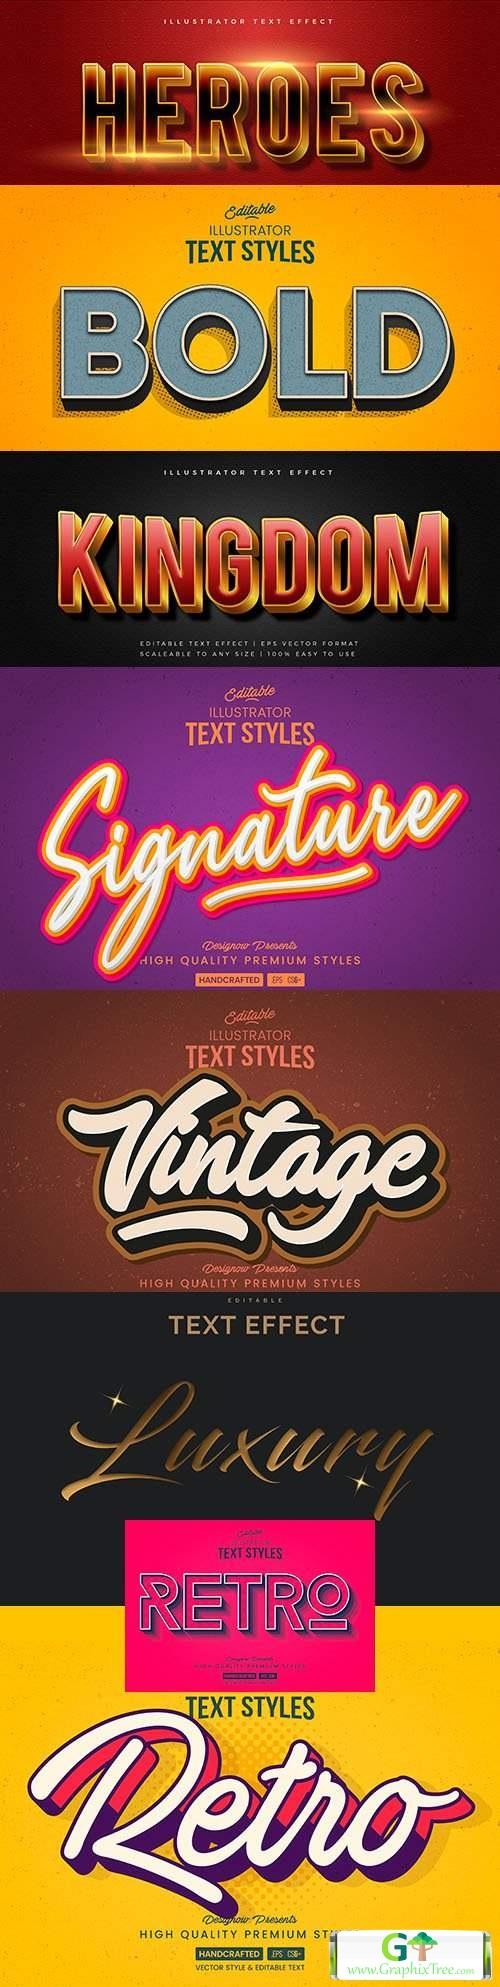 Editable font effect text collection illustration design 210